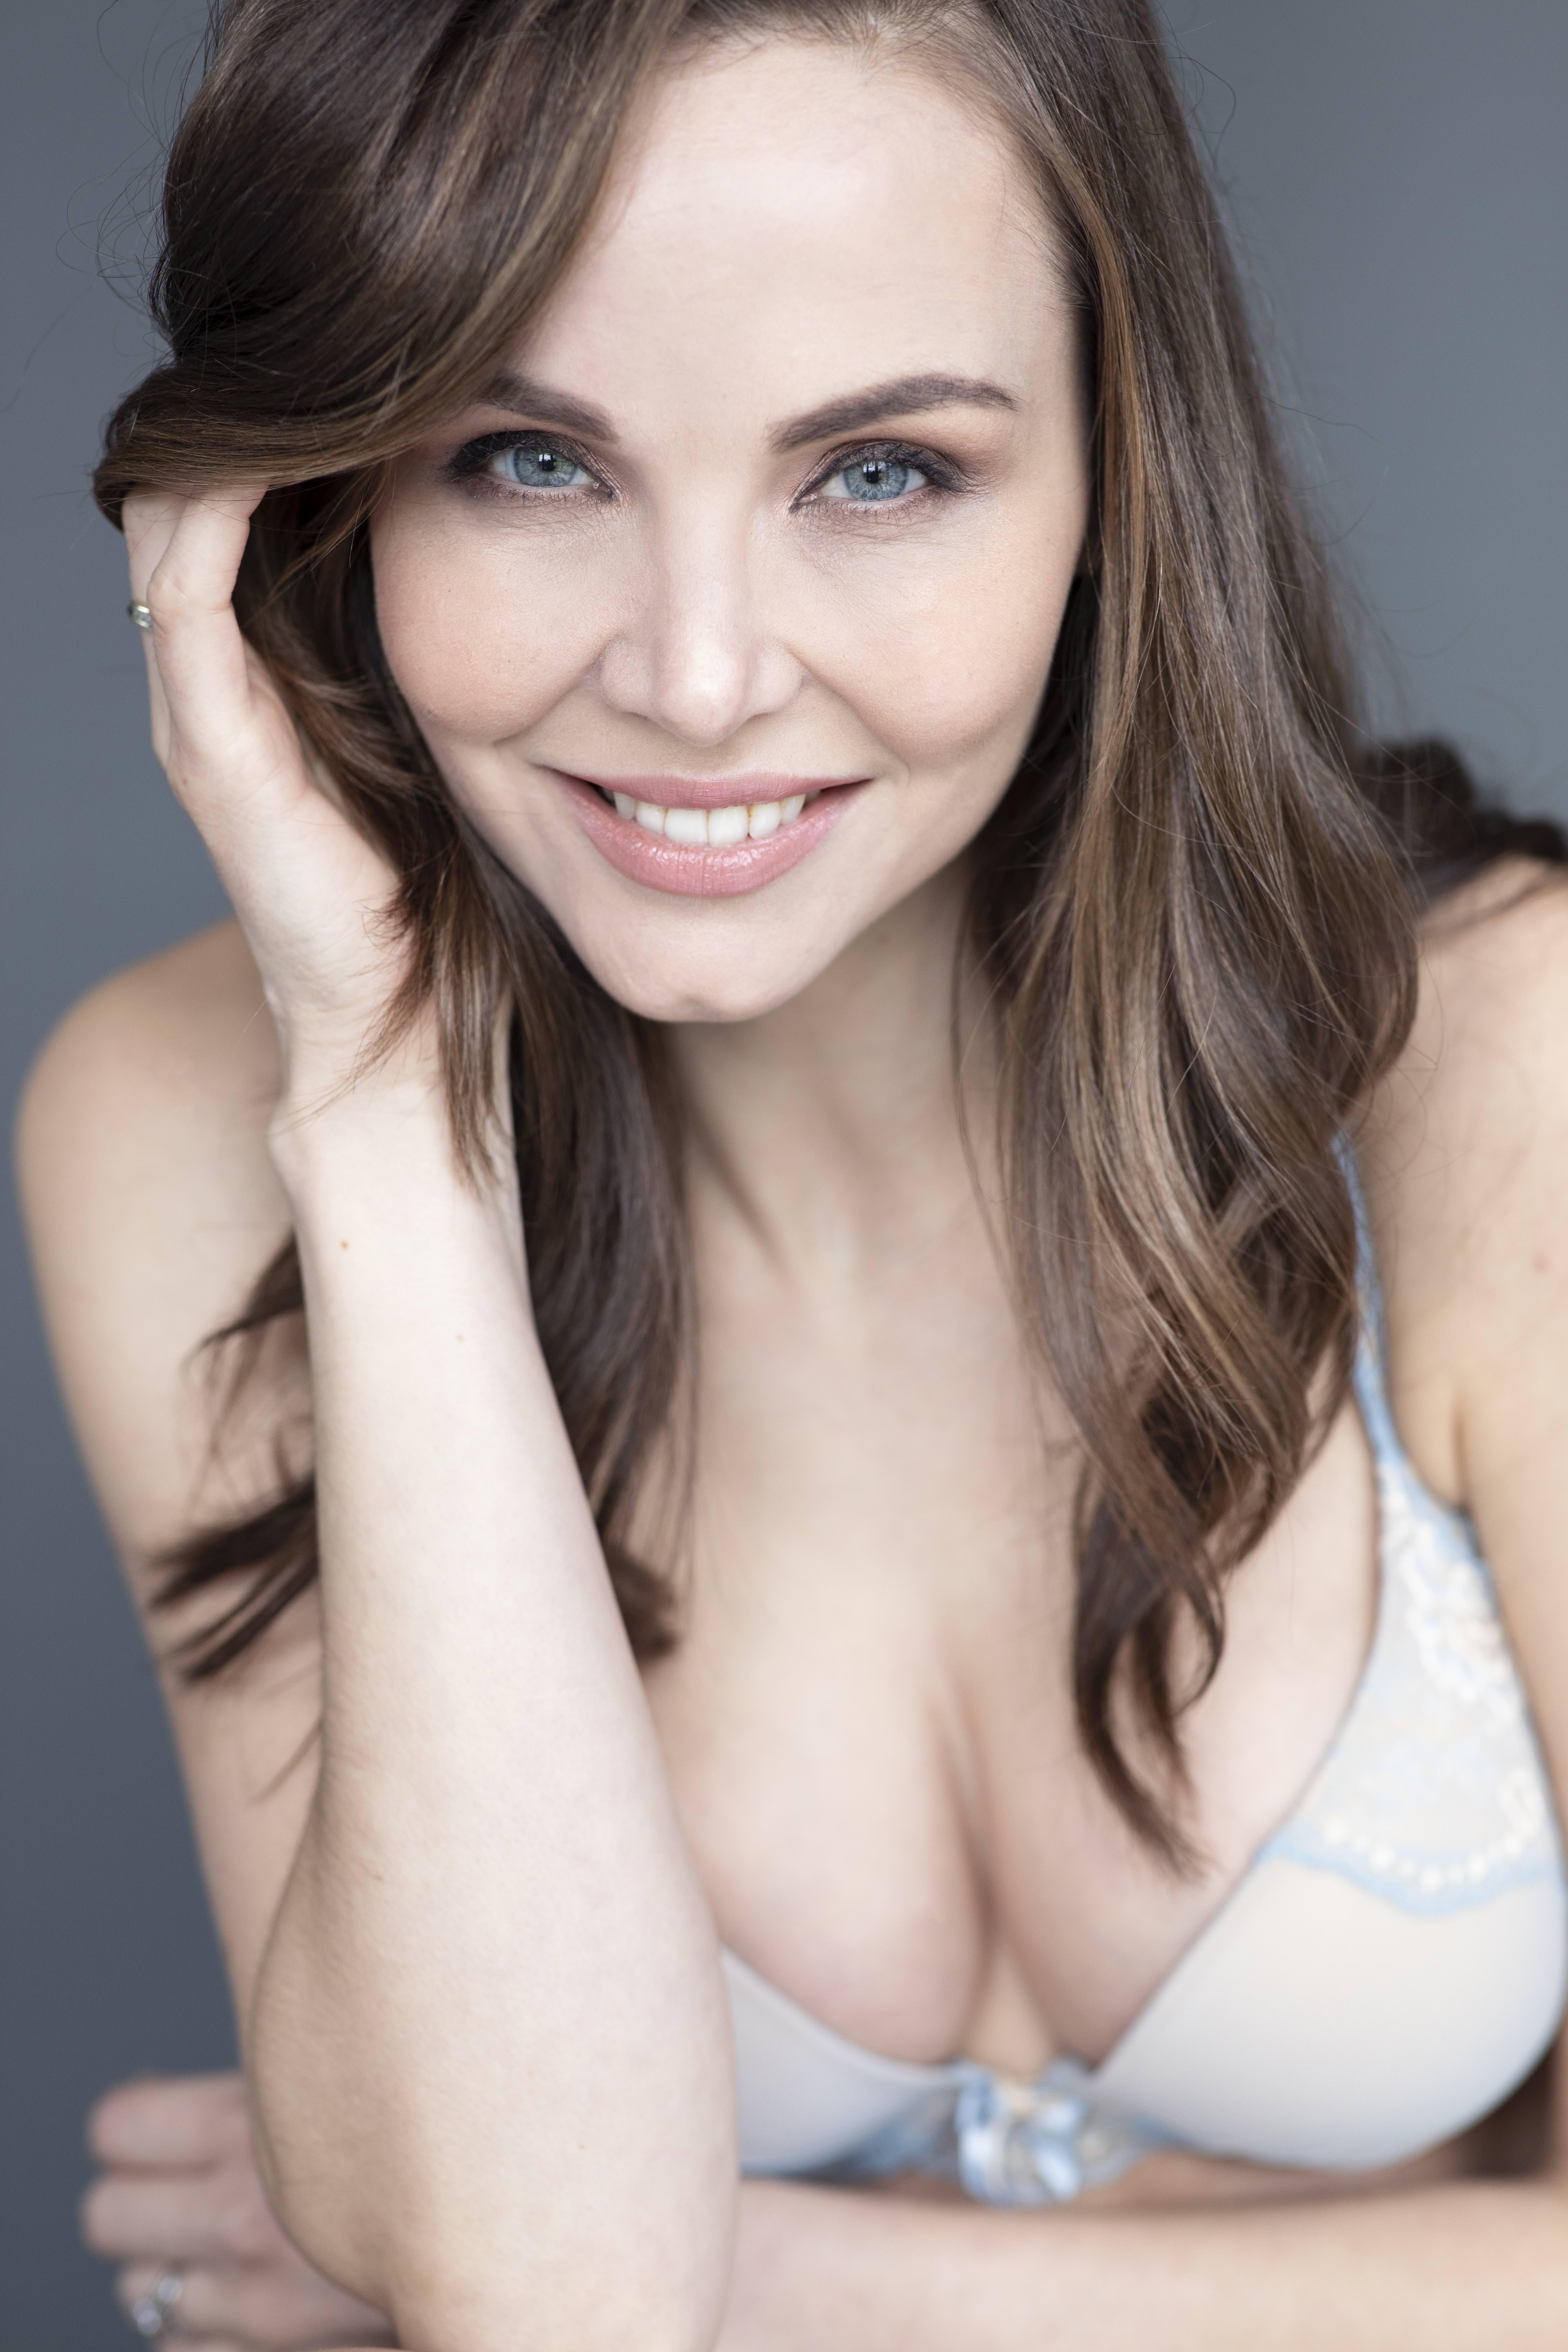 Web-Shine-Female-Model-Louise-Manchester-Leeds-Mature-Classic-Lifestyle-04.jpg#asset:48747